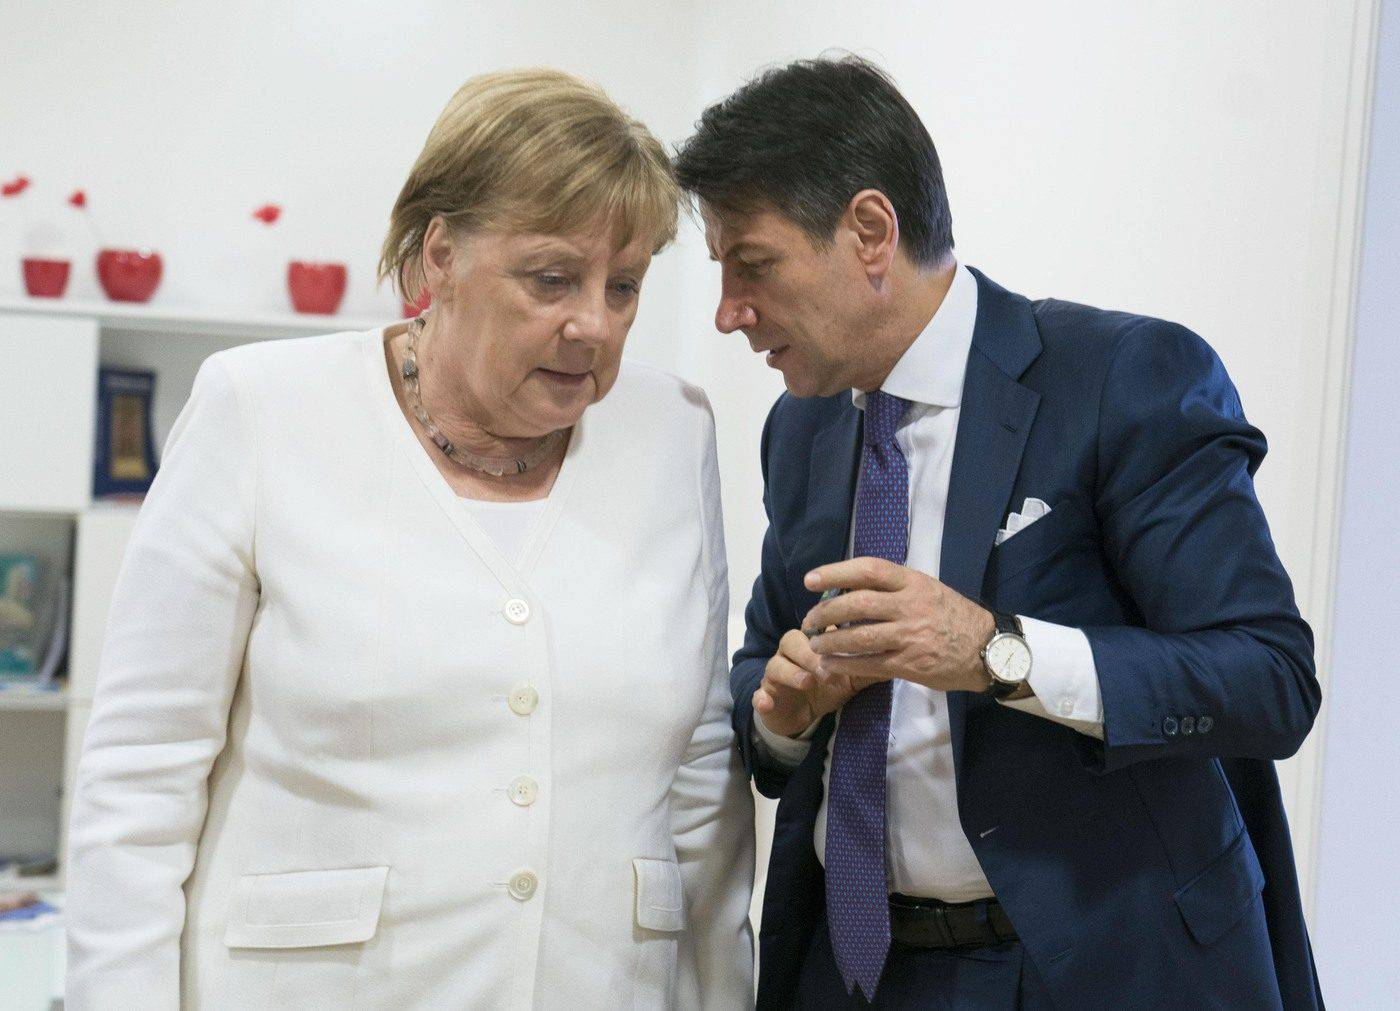 Merkel Olanda - Giuseppe Conte - Leggilo,org